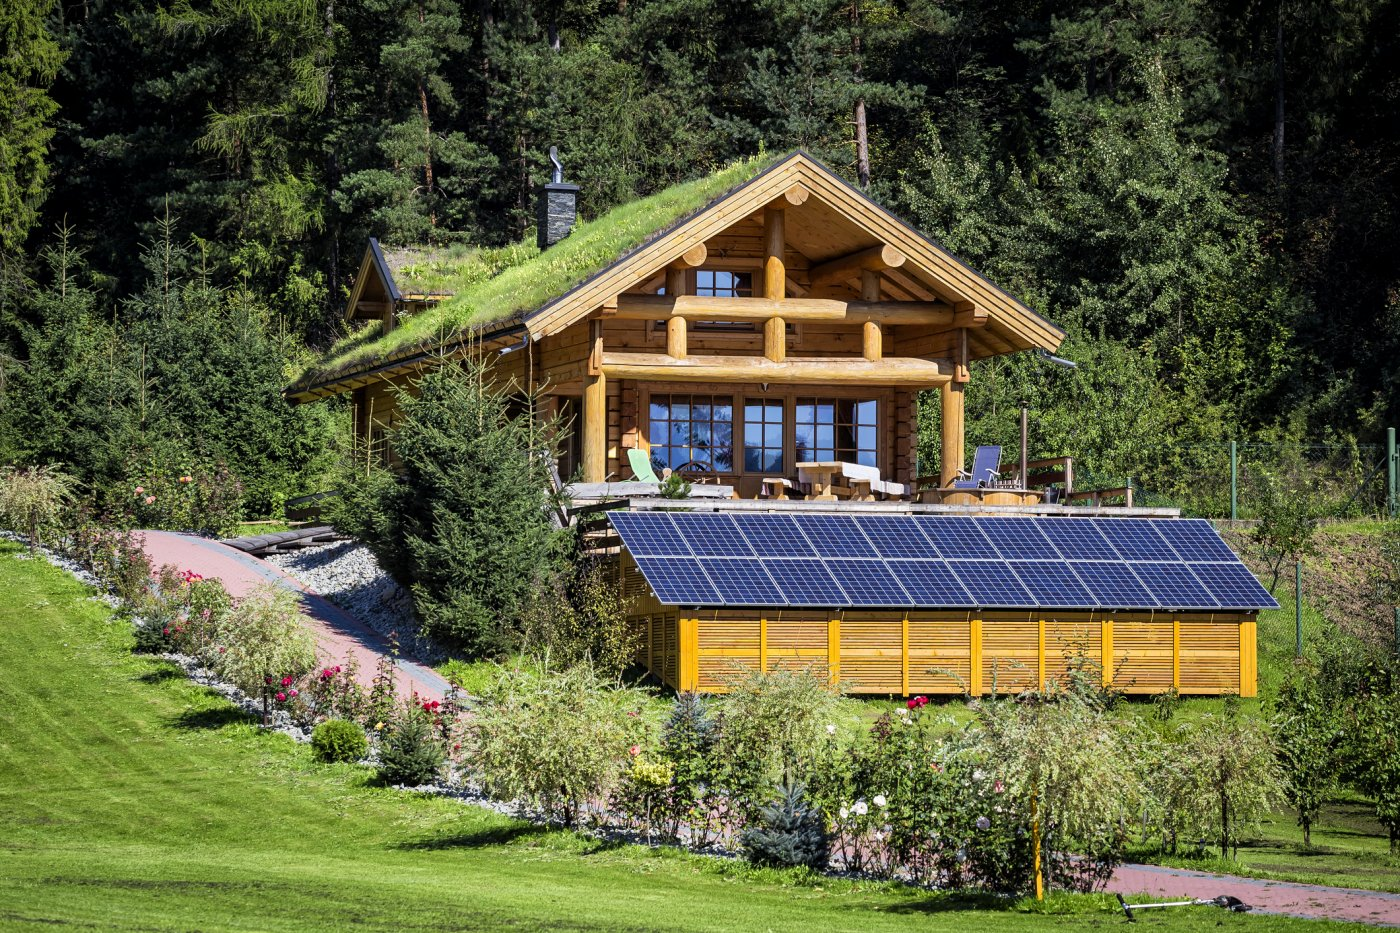 hytte med solceller på låve eller fjøs